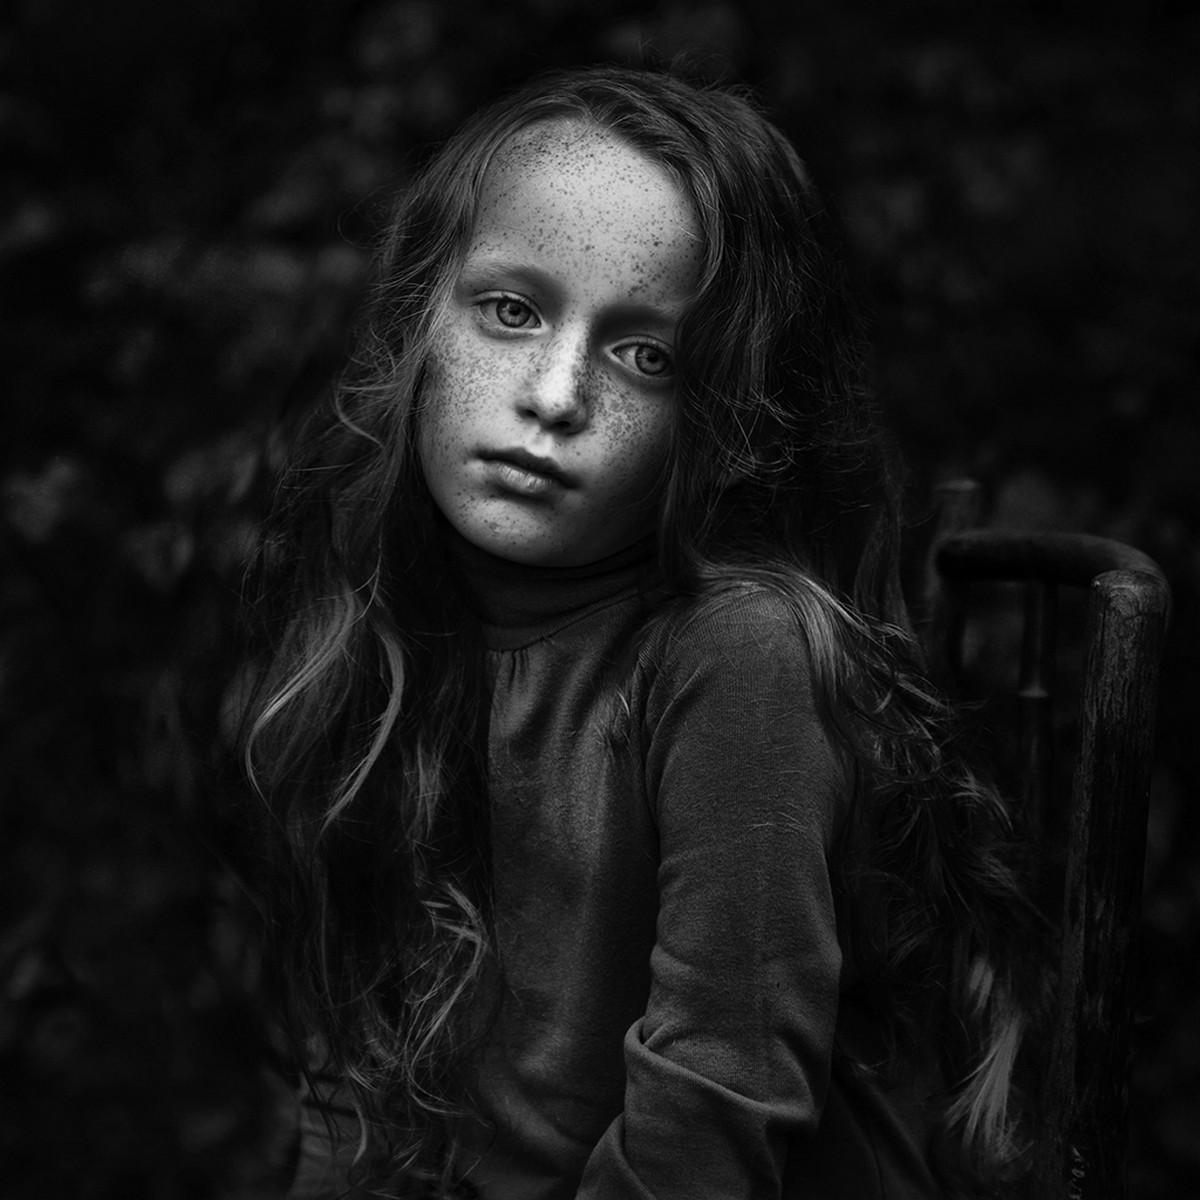 pobediteli_konkursa_herno_beloj_detskoj_fotografii_2018_6